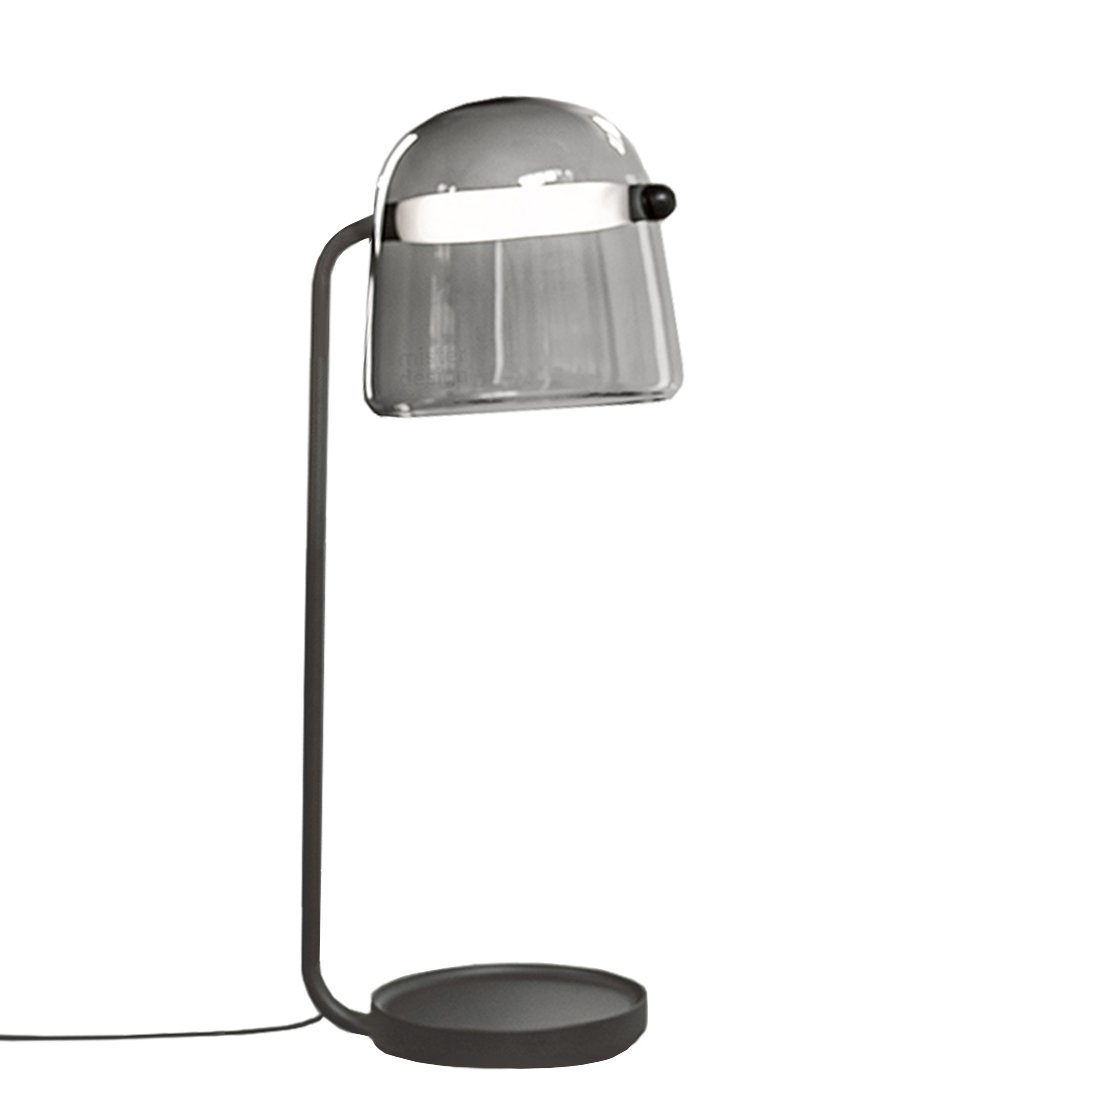 Brokis Mona Vloerlamp Large Donkergrijs - Zwarte Body